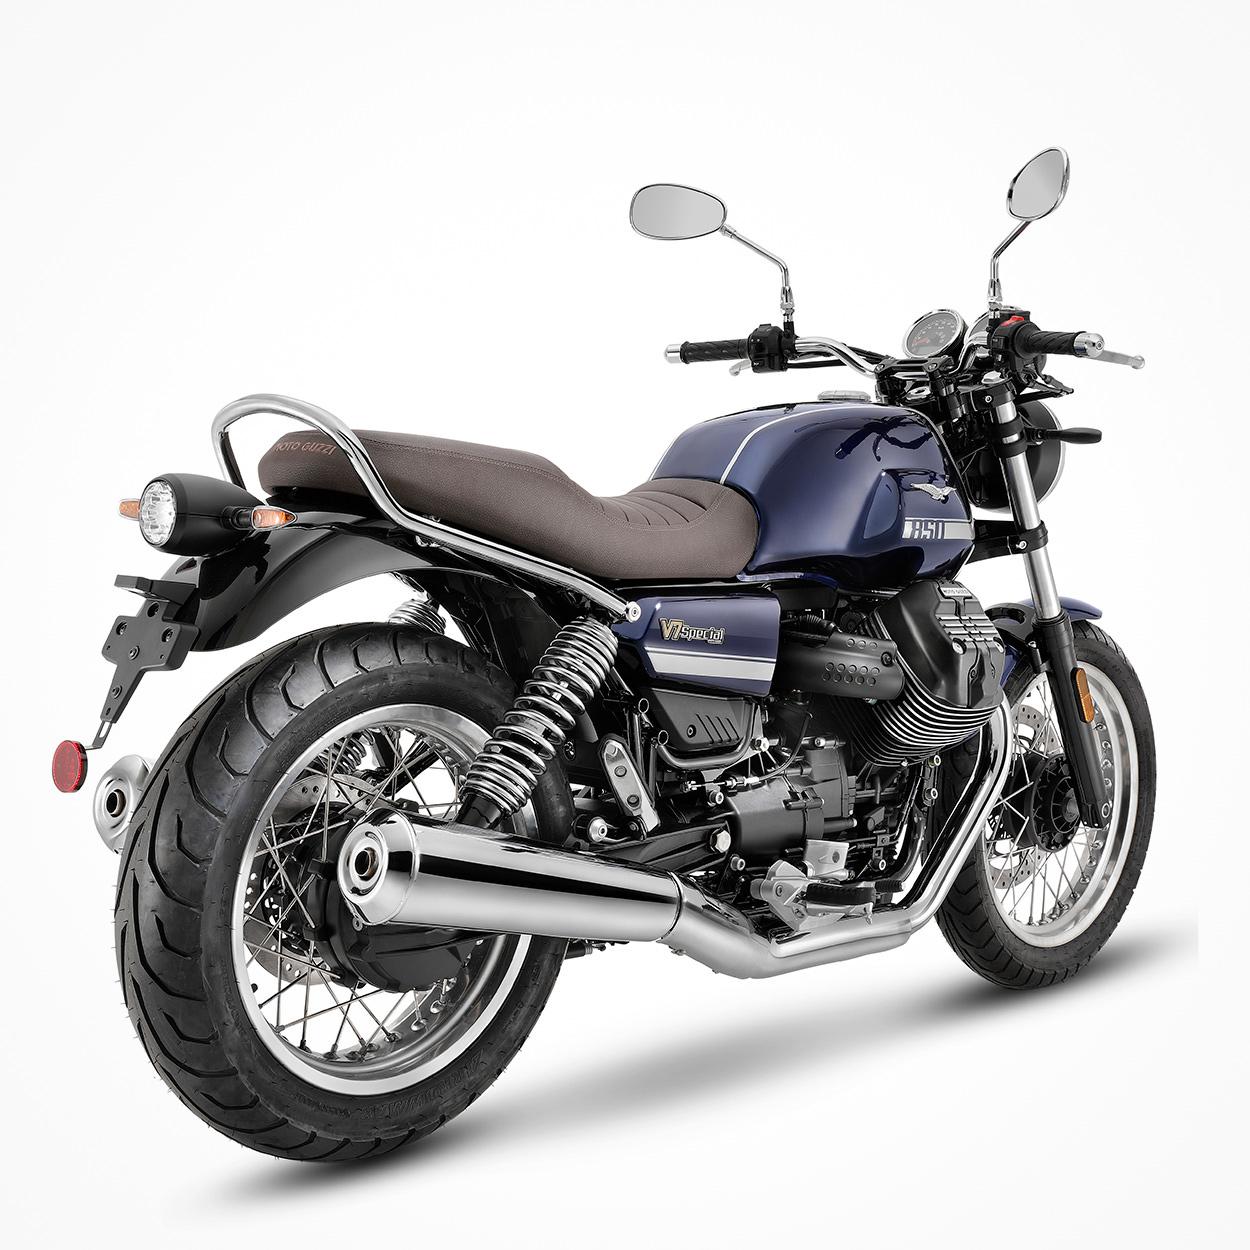 2021 Moto Guzzi V7 Special